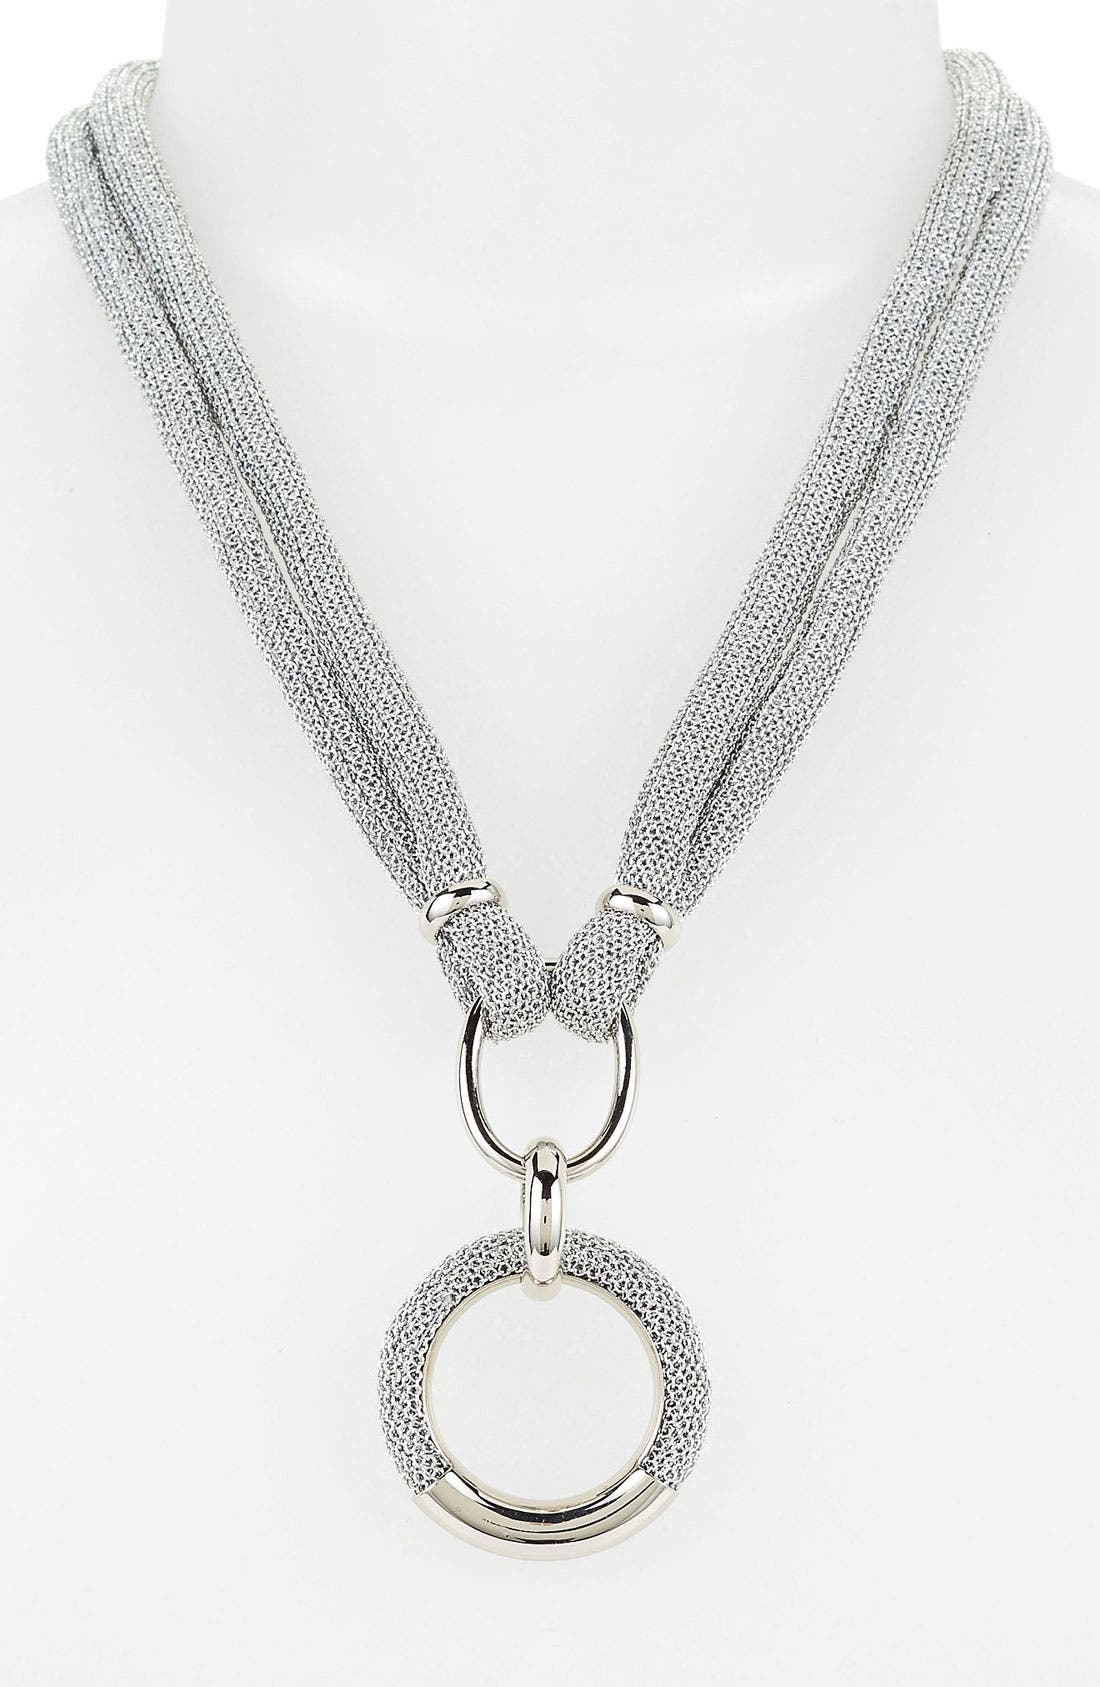 Main Image - Adami & Martucci 'Mesh' Pendant Necklace (Nordstrom Exclusive)